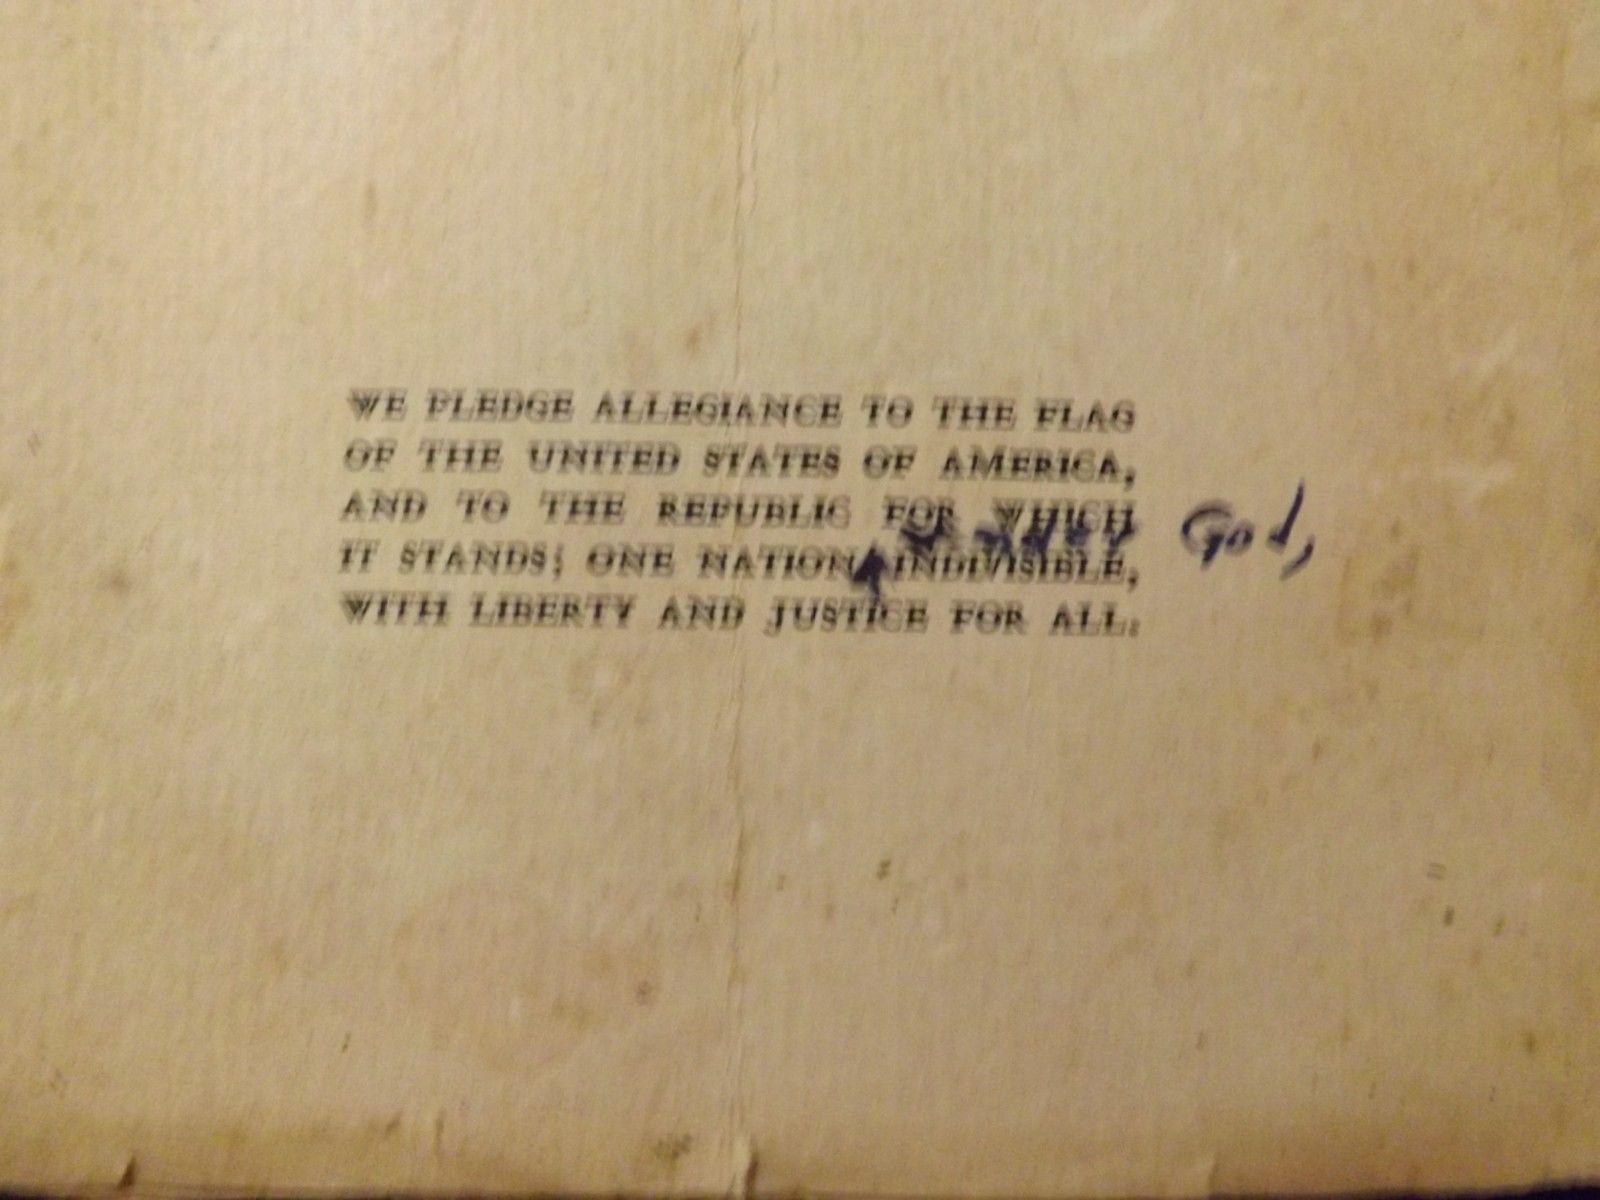 Vintage Order of Elks vest with pins, 1951/52 booklets flag and letter of accept image 5